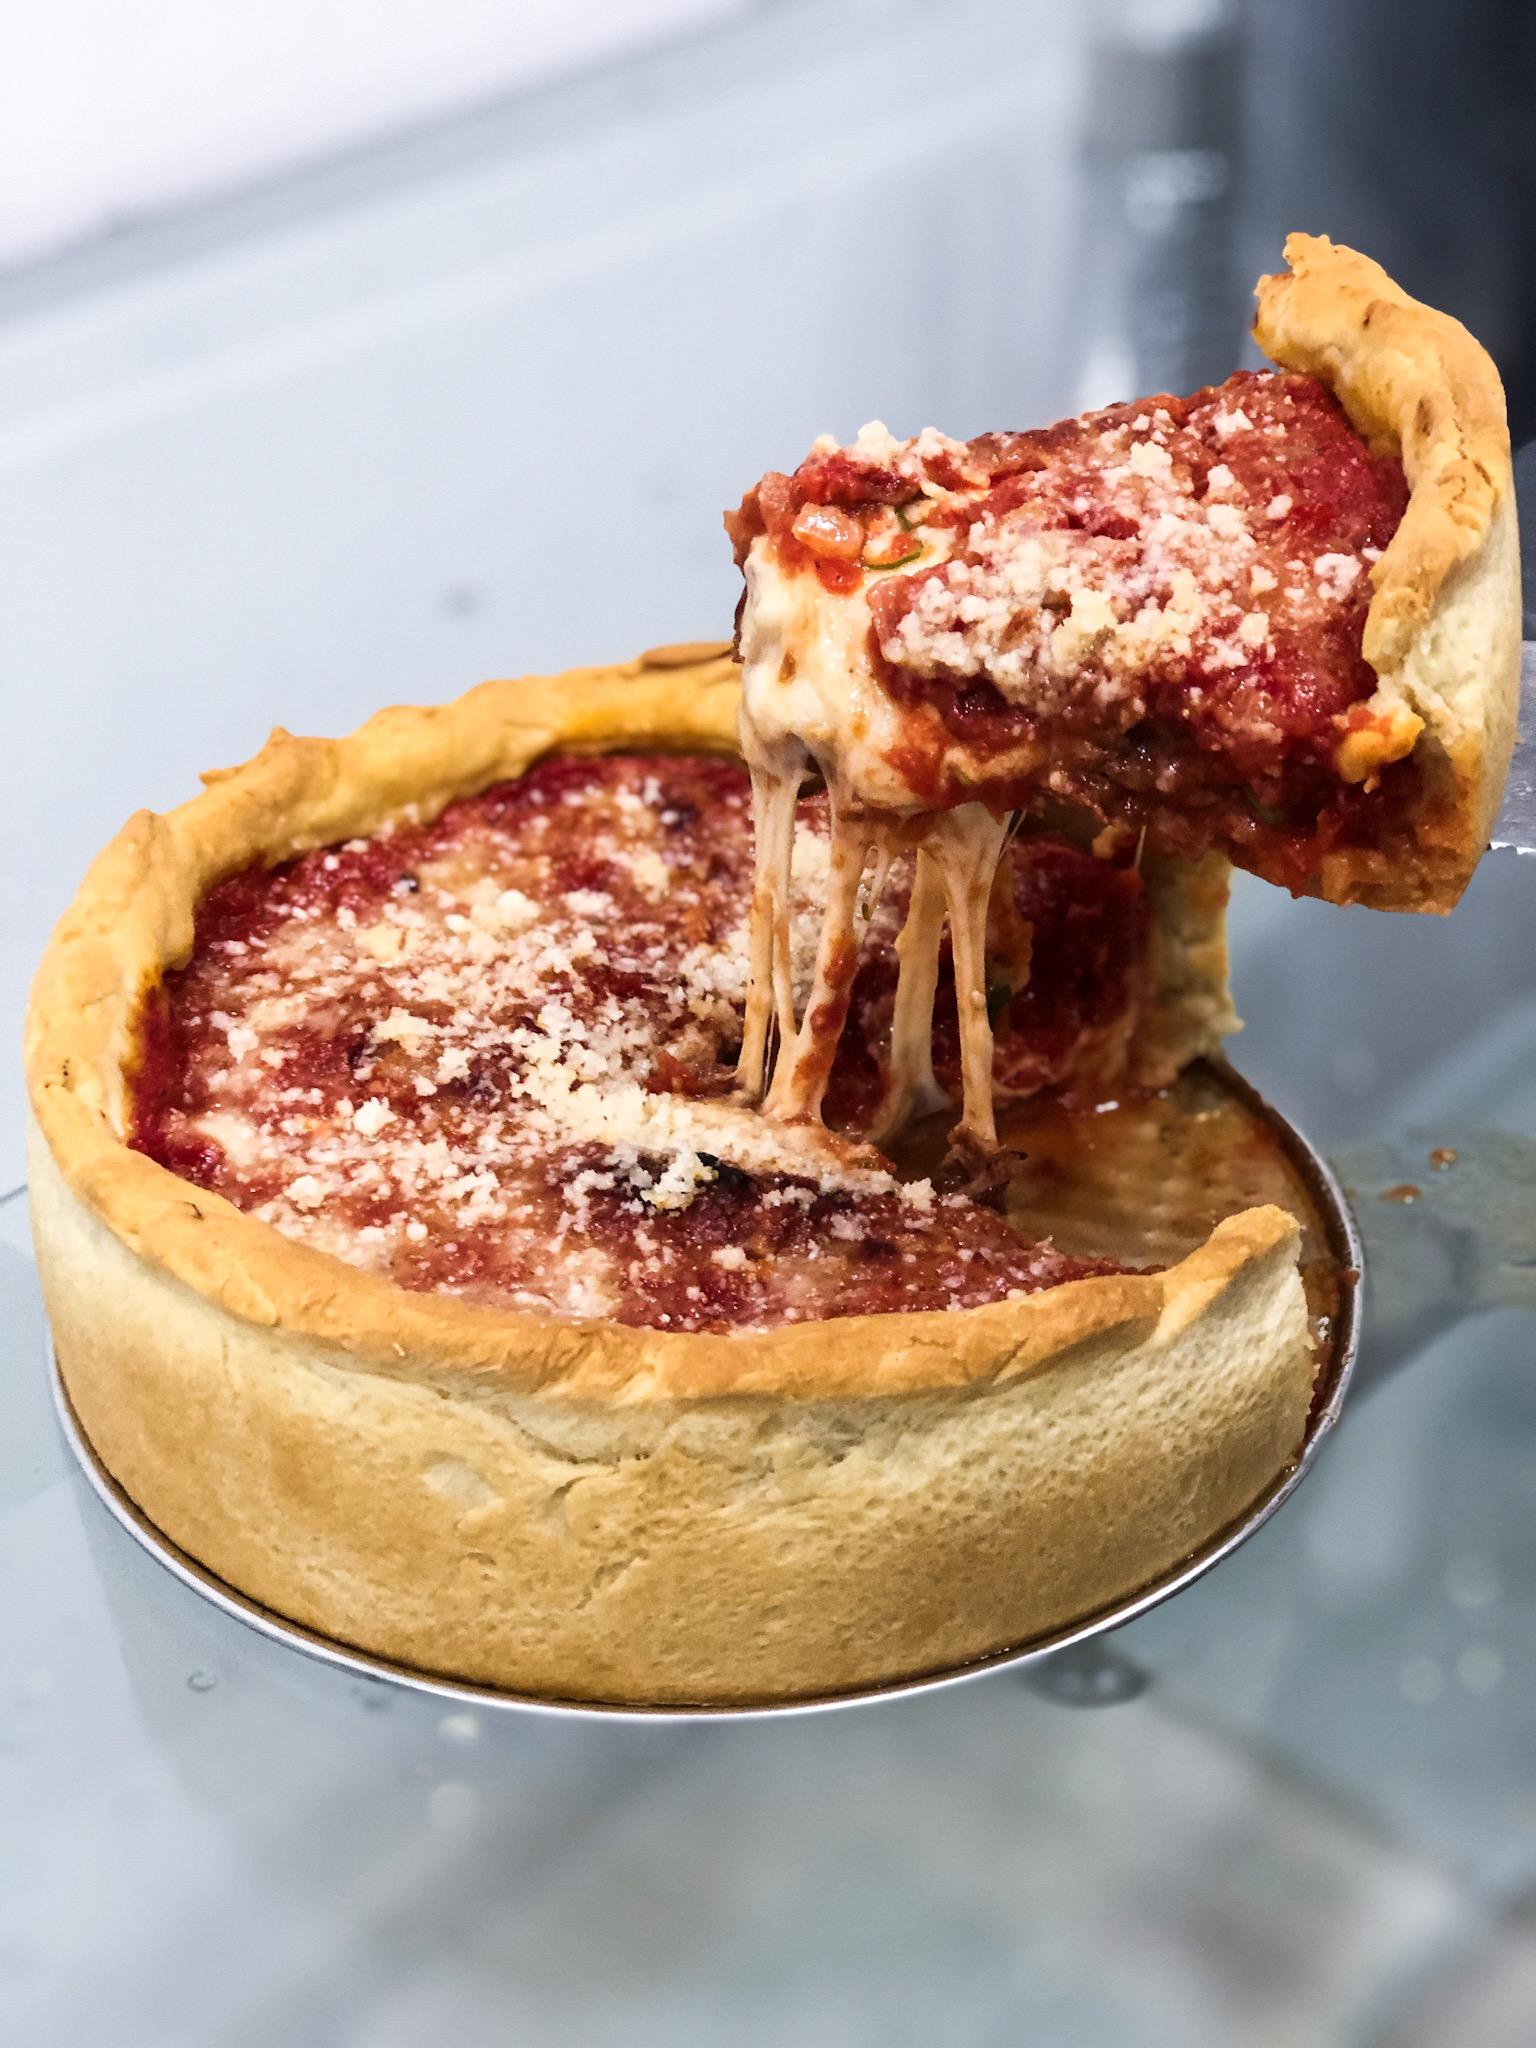 https://www.stonerchef.pl/wp-content/uploads/2019/07/gotowa-deep-dish-pizza.jpg